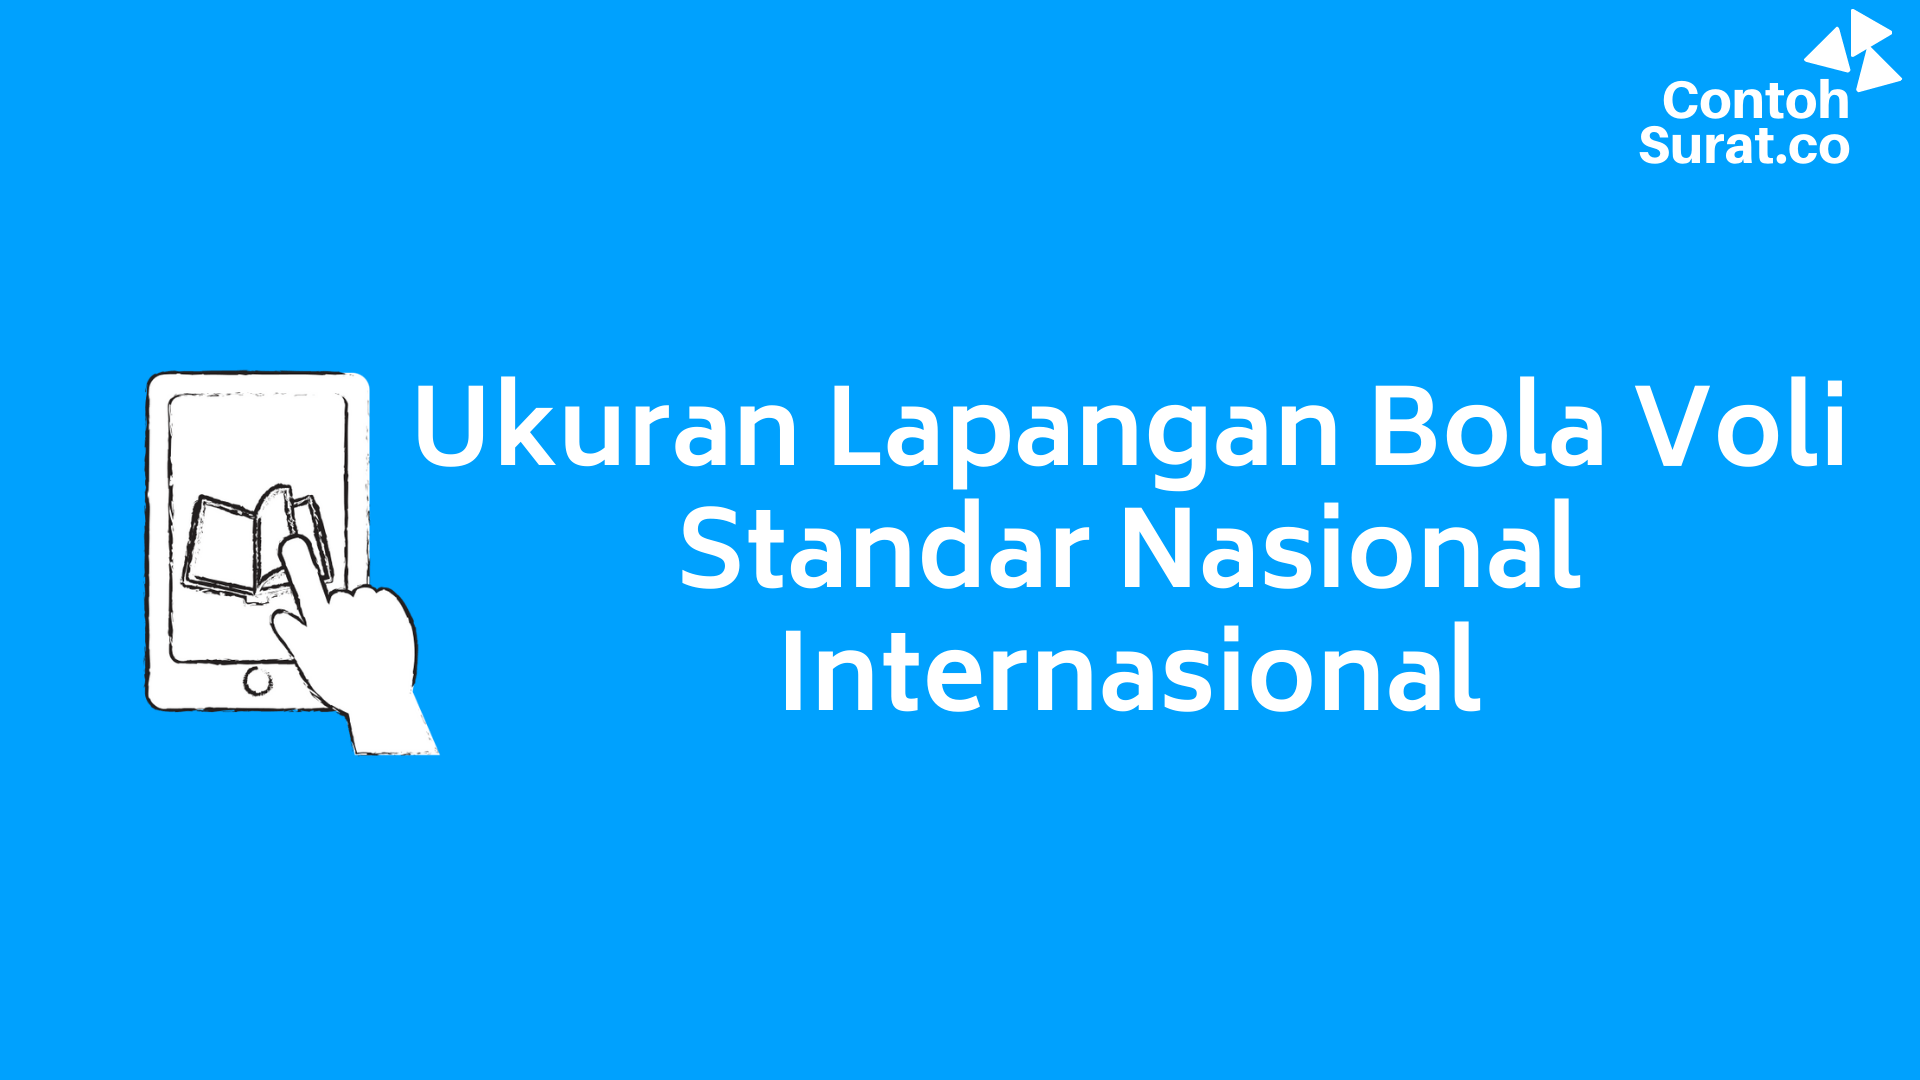 Ukuran Lapangan Bola Voli Standar Nasional Internasional